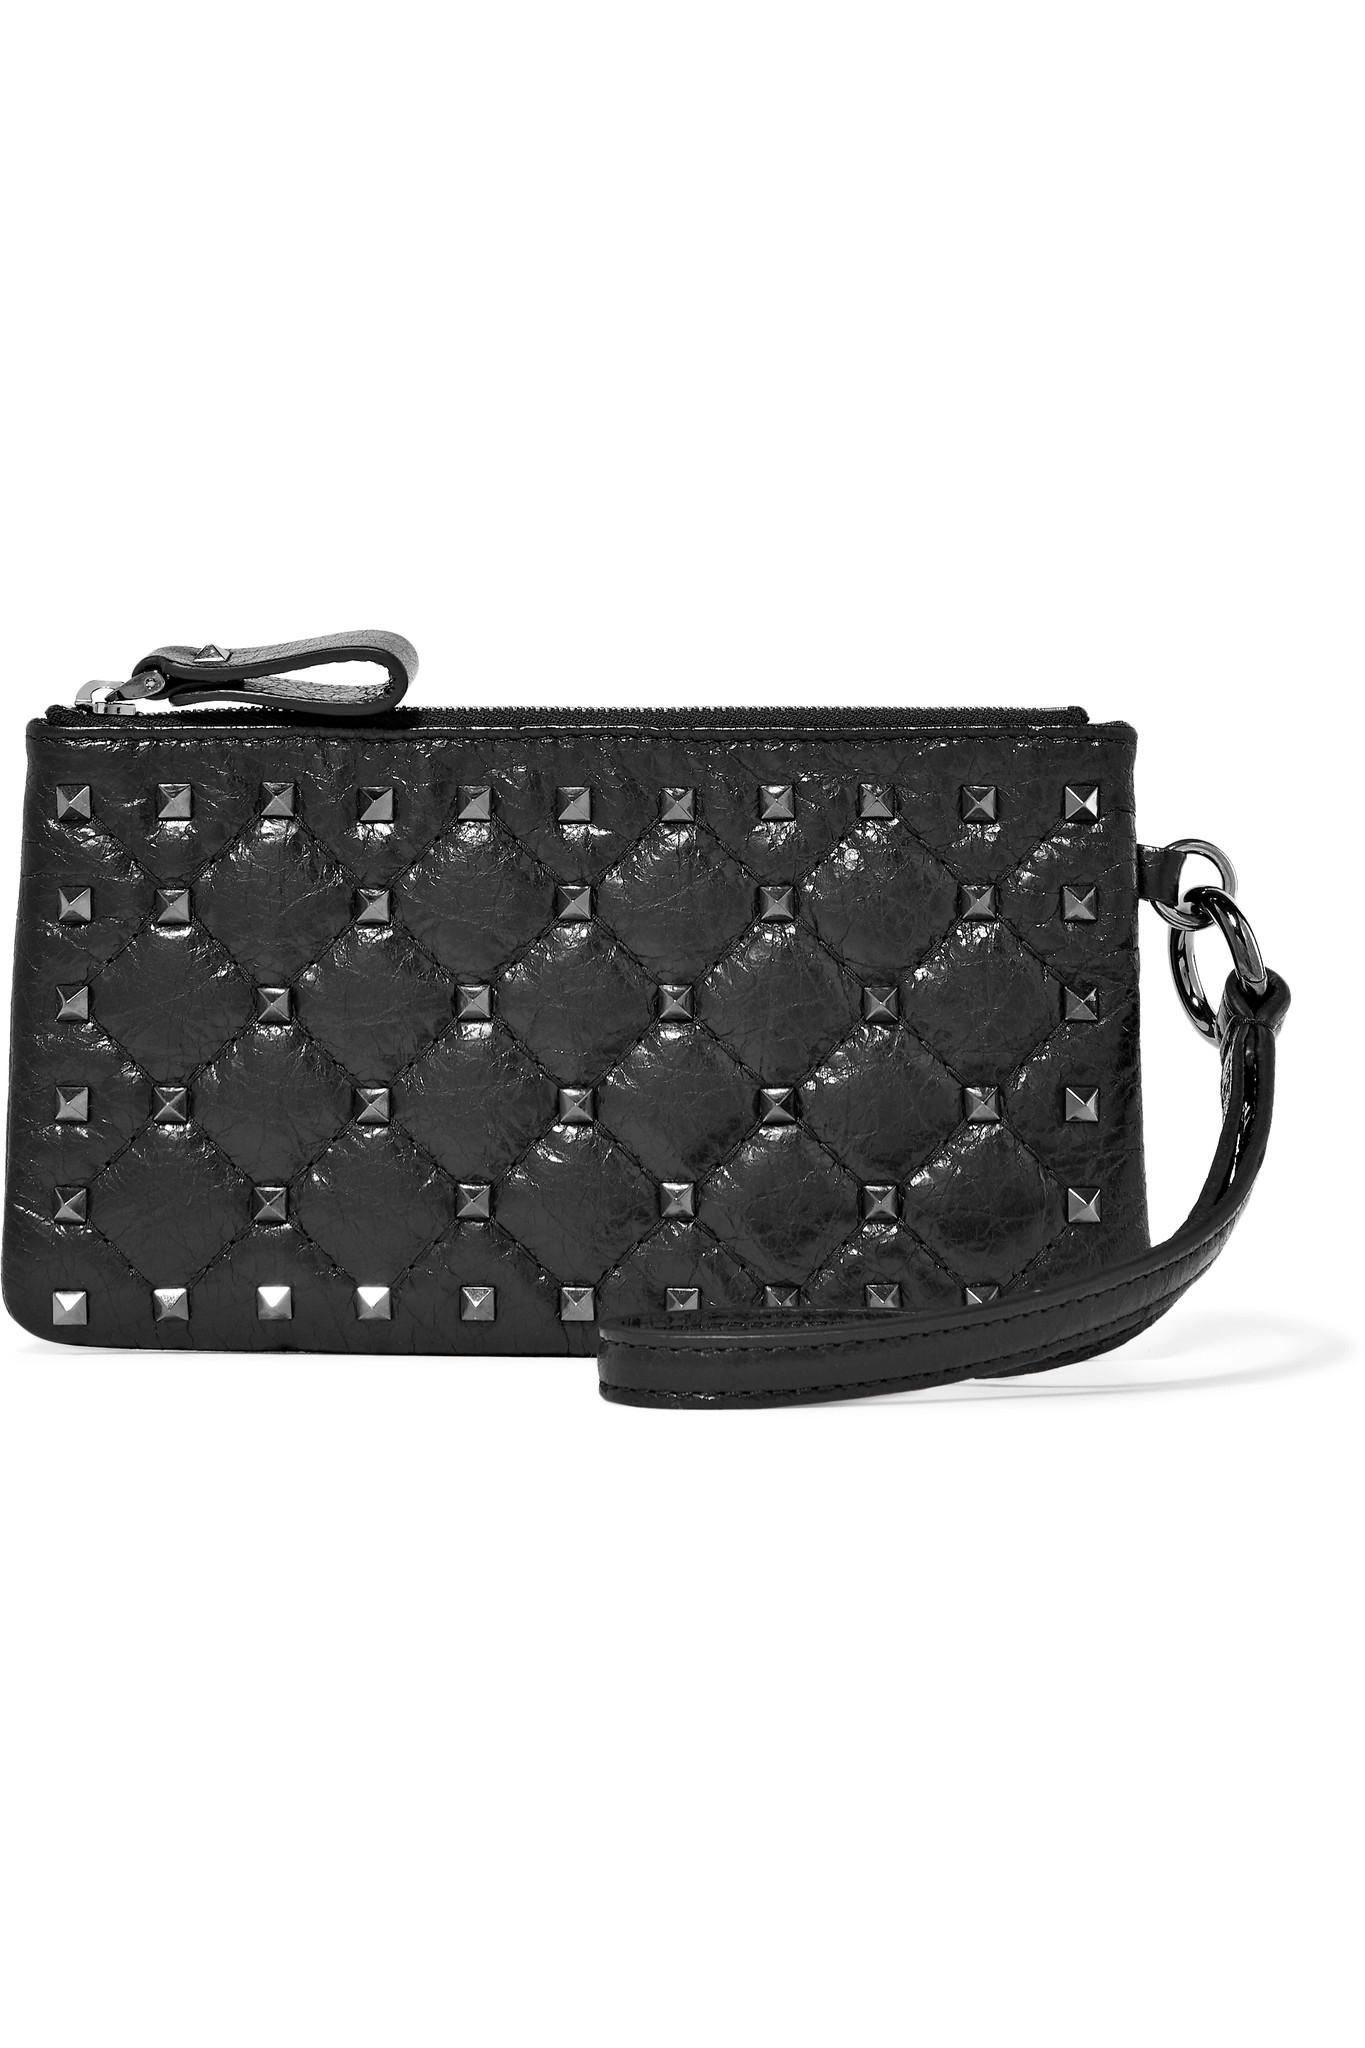 Valentino Garavani Rockstud Spike Quilted Cracked-leather Shoulder Bag - Black Valentino WcZkXi